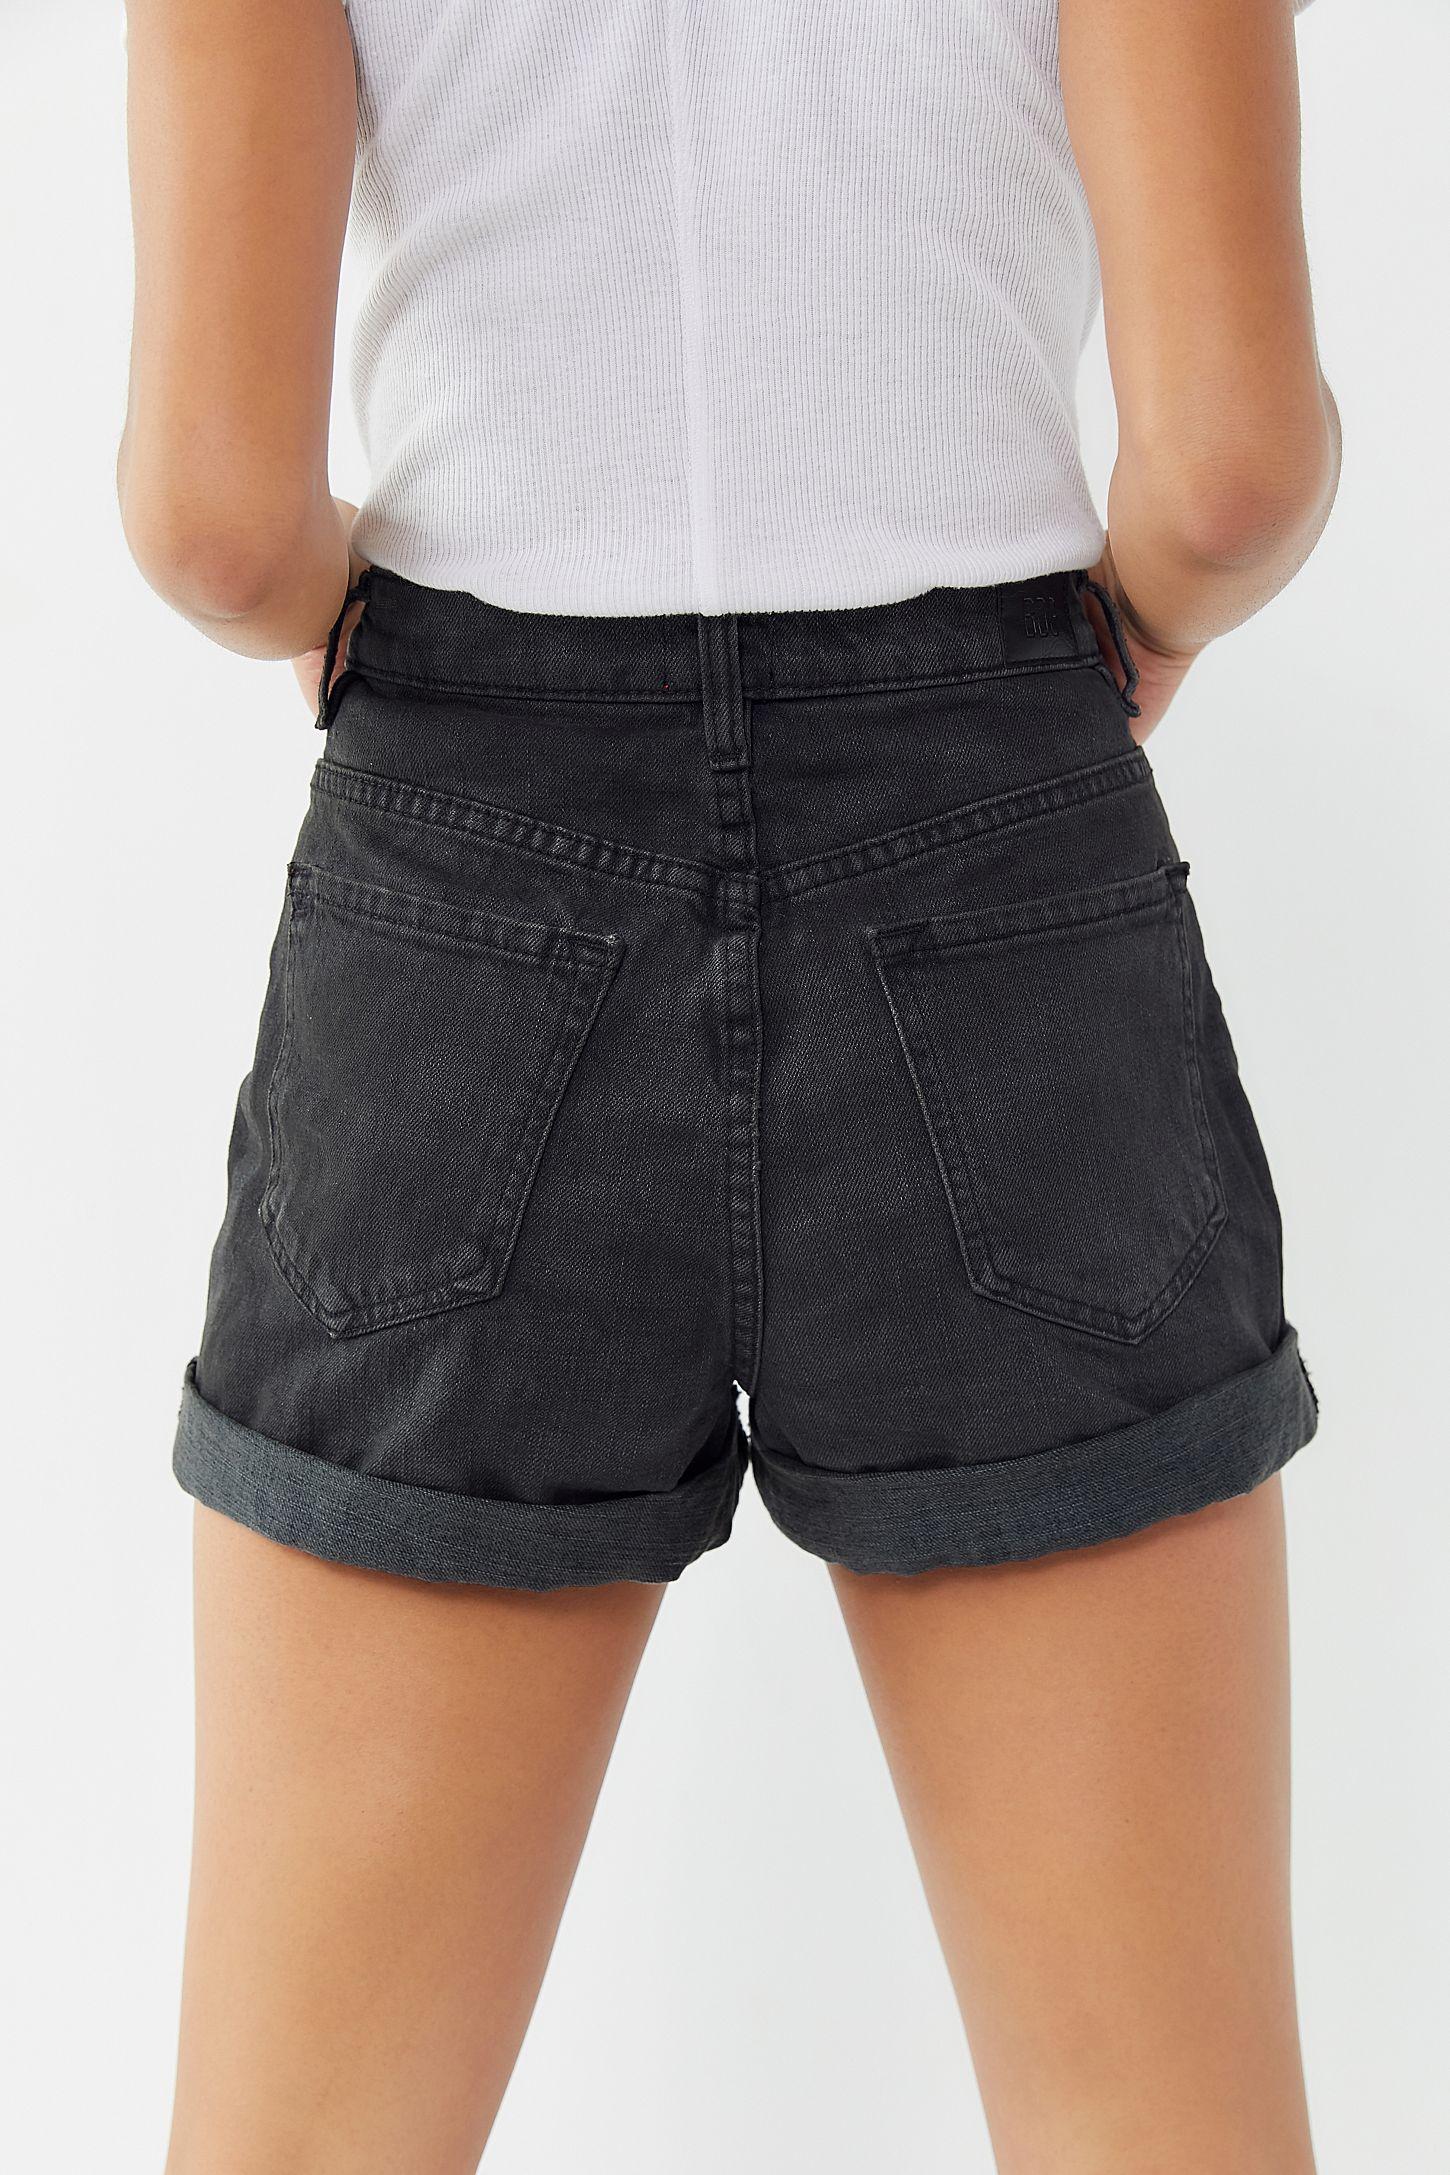 6e040237112 BDG Denim High-Rise Mom Short – Black | Urban Outfitters Canada